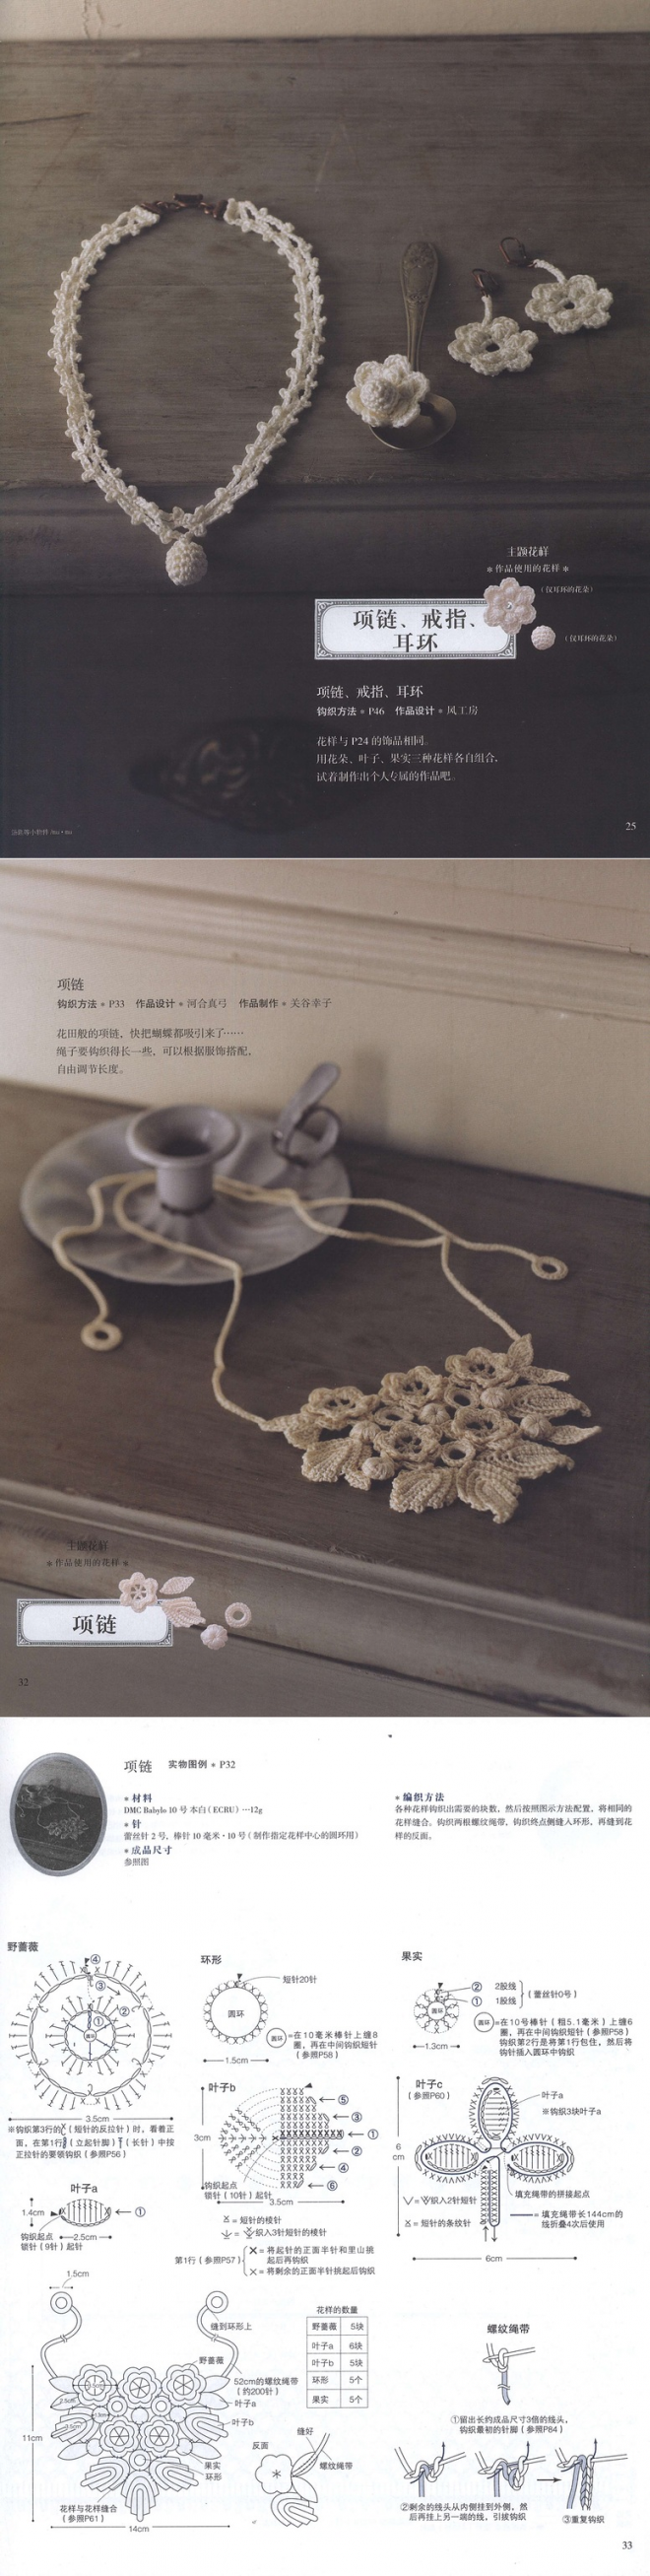 Журнал:«Elegant Irish Crochet Lace 2013»